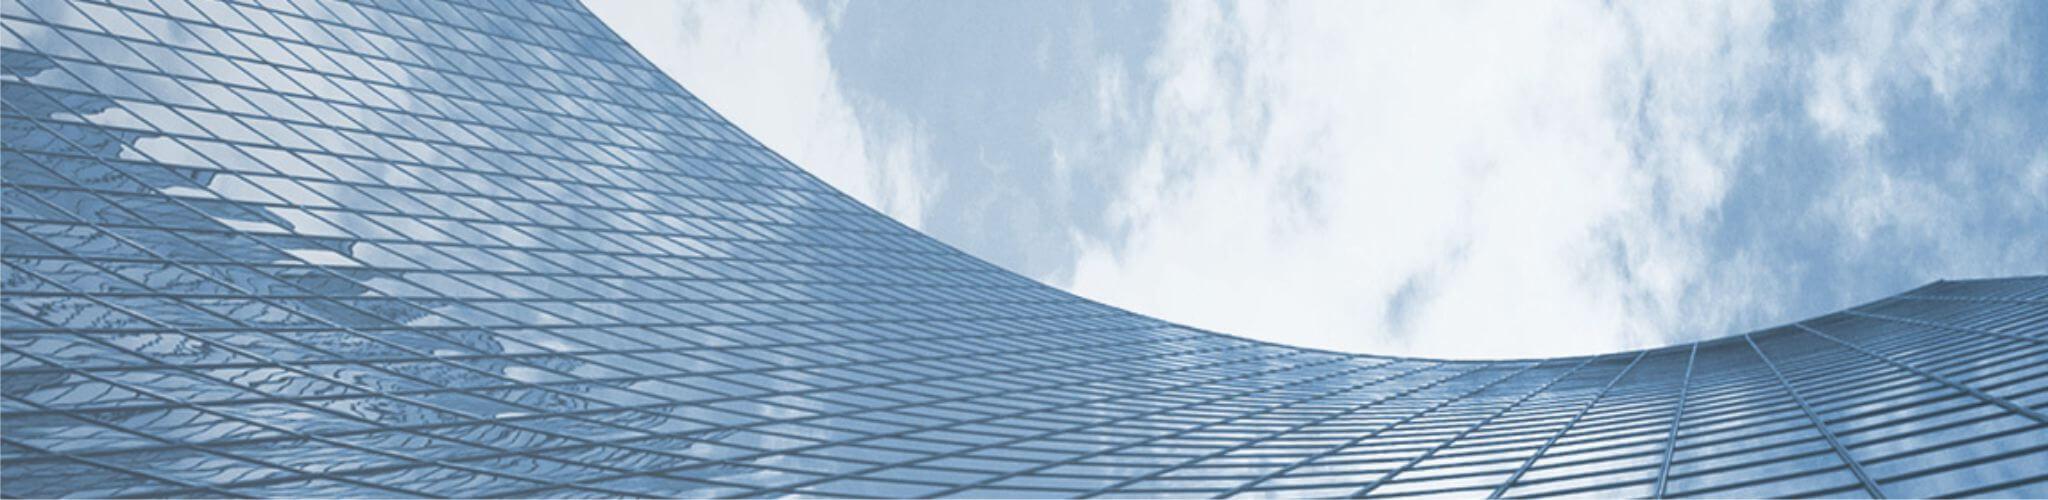 banner-portal-pt-cardig-aero-corporate-image